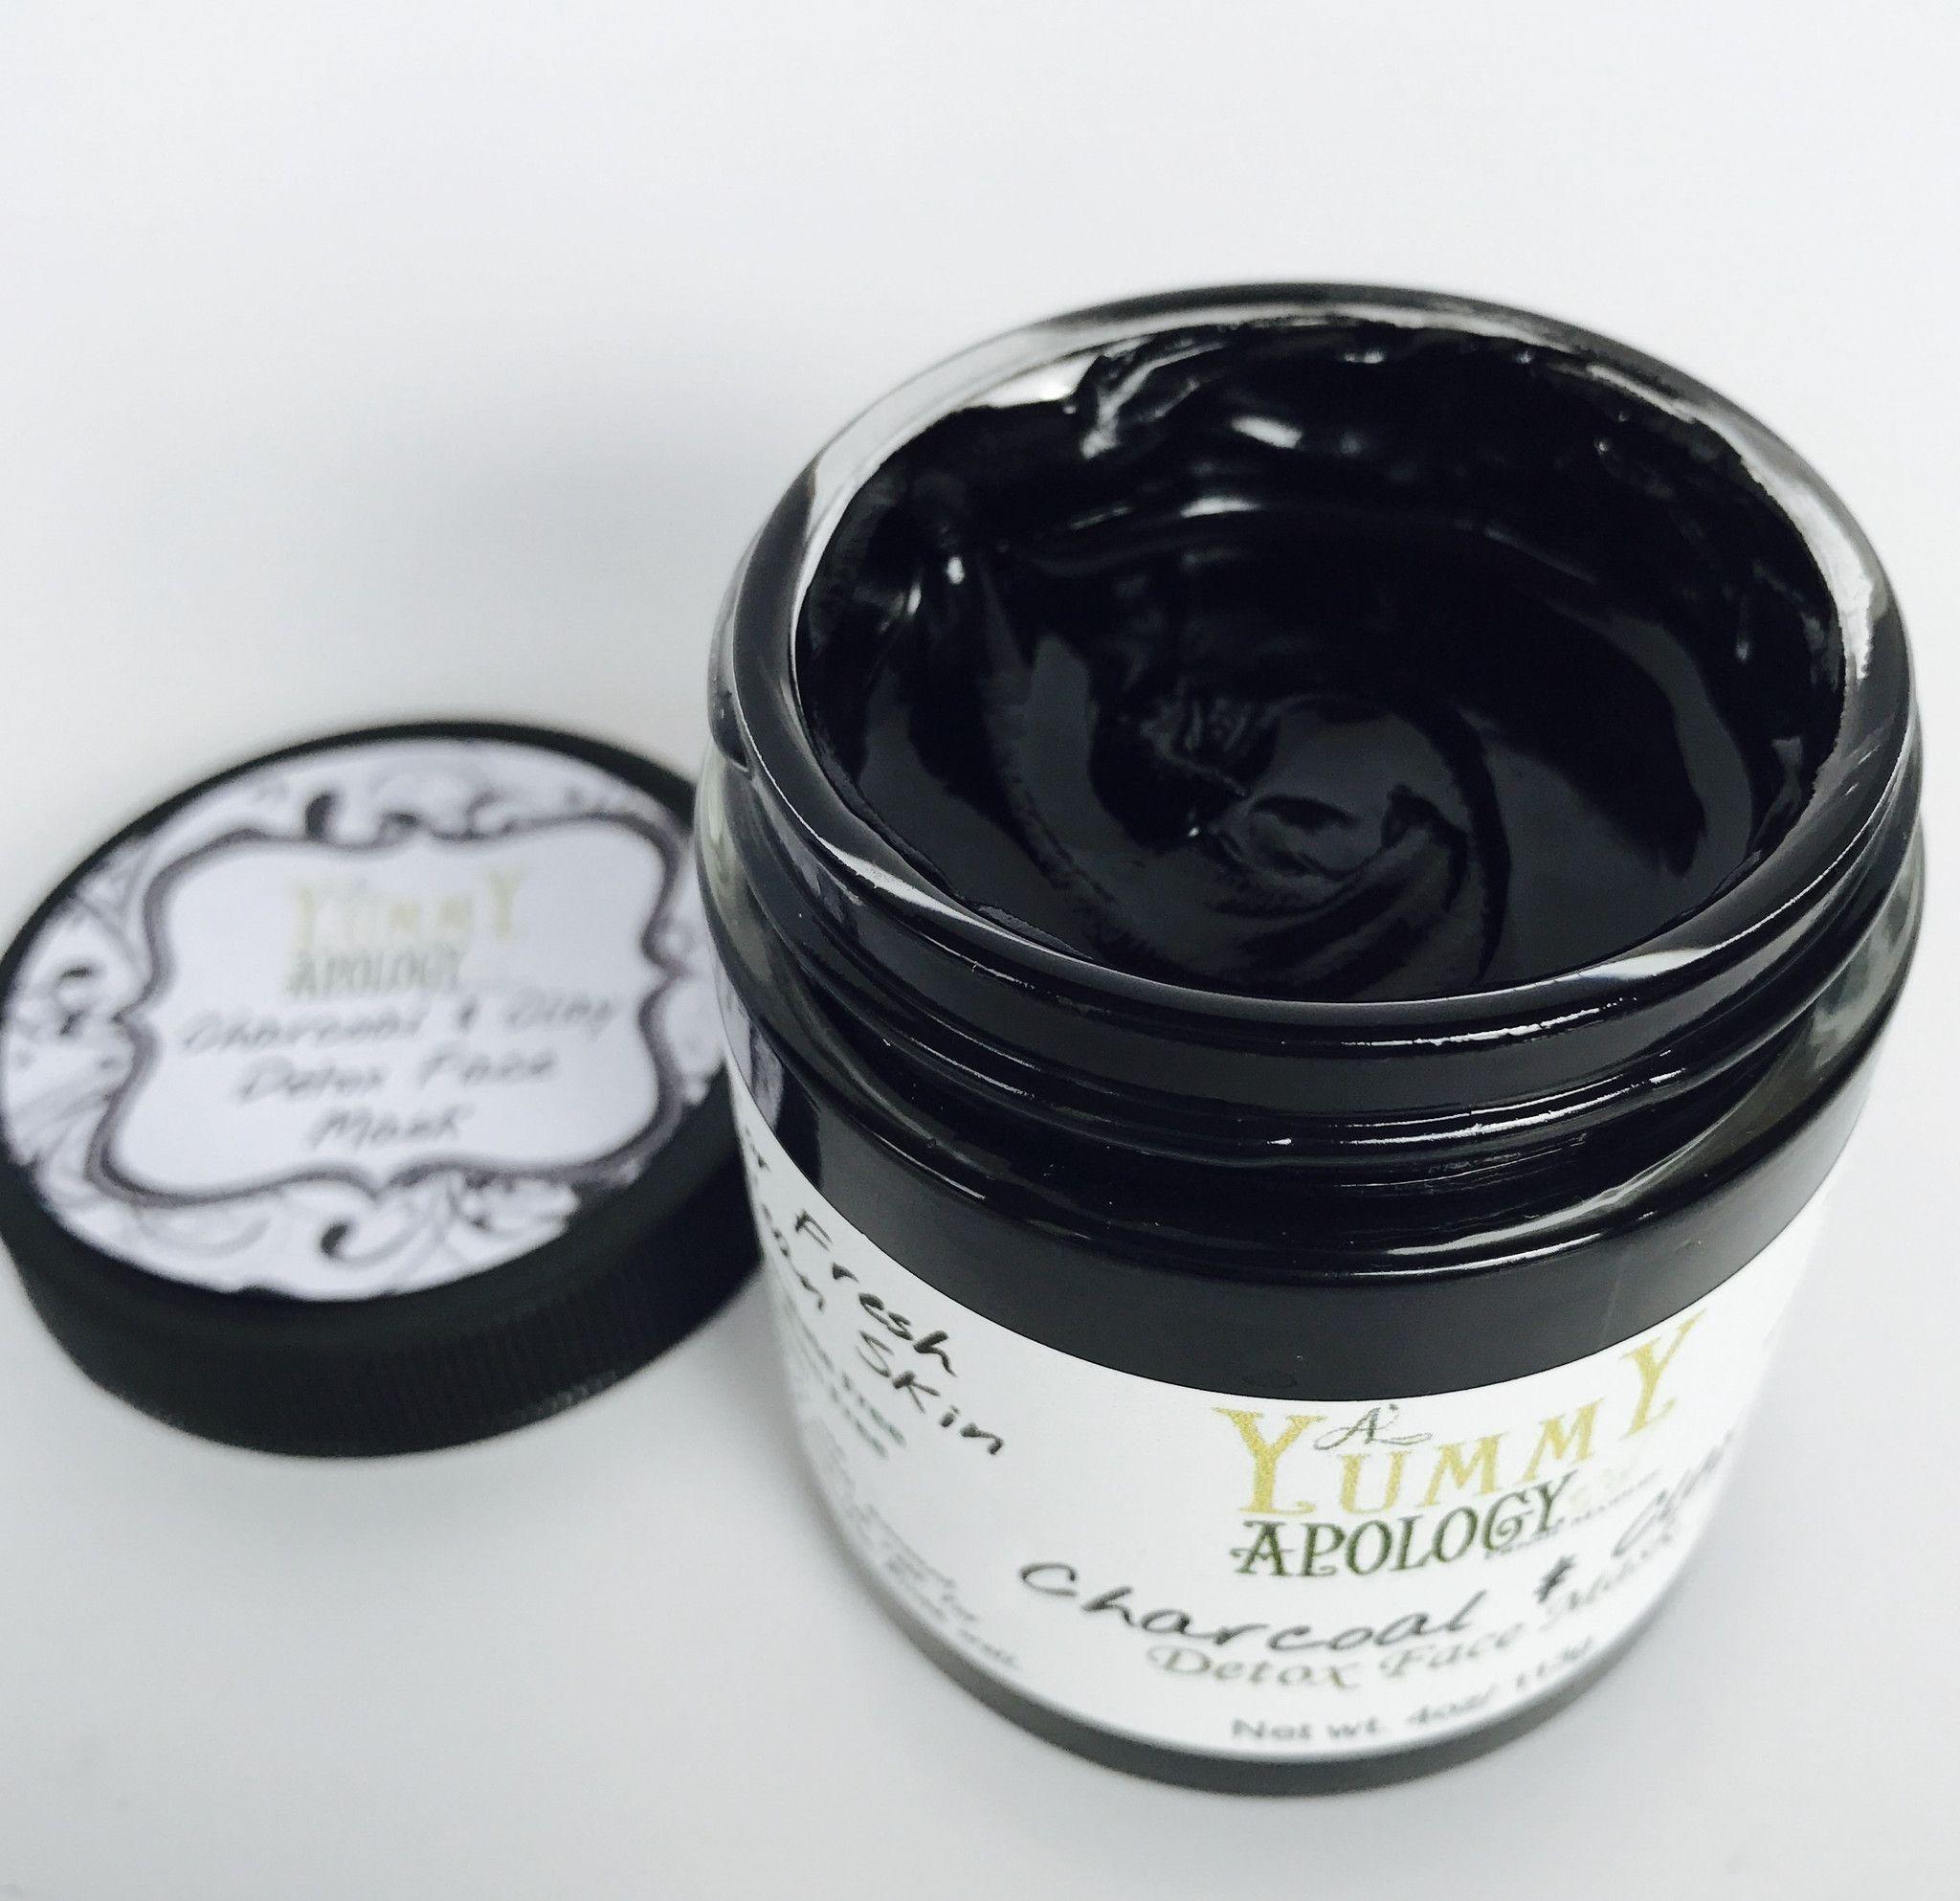 Charcoal & Clay Detox Mask,  #Charcoal #Clay #Detox #hairdetoxmaskproducts #Mask